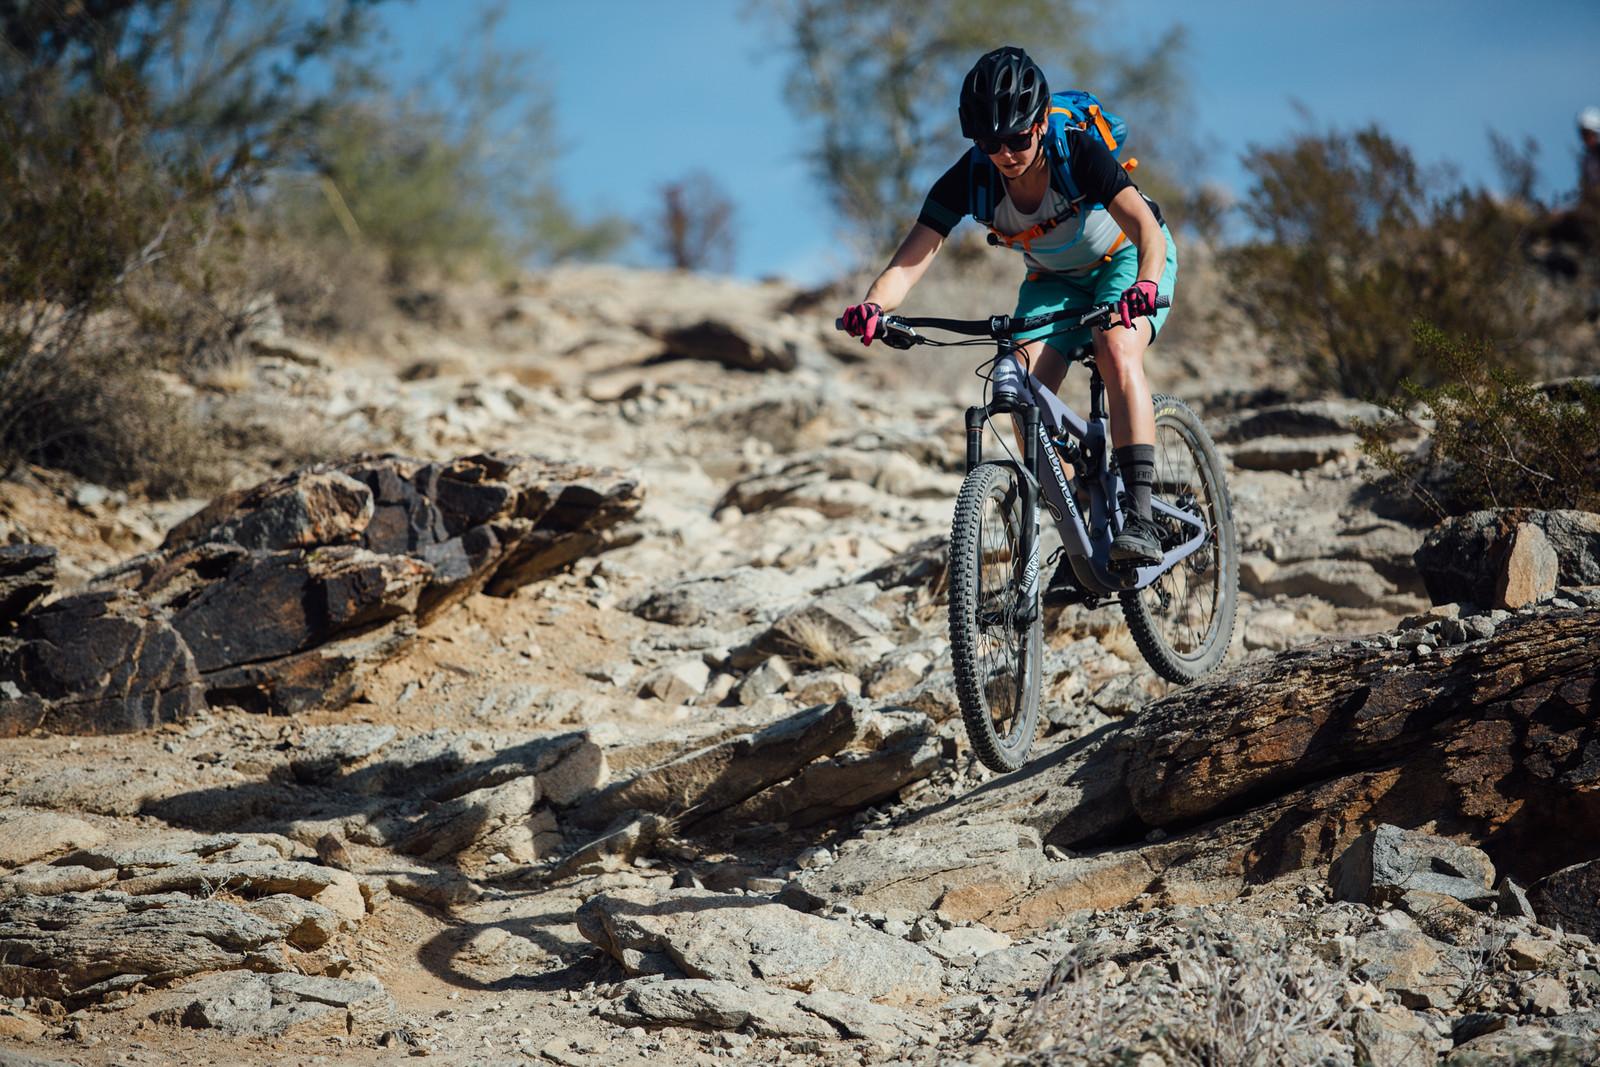 Juliana Roubion C S - 2016 Vital MTB Test Sessions - Juliana Roubion C S - 2016 Vital MTB Test Sessions - Mountain Biking Pictures - Vital MTB